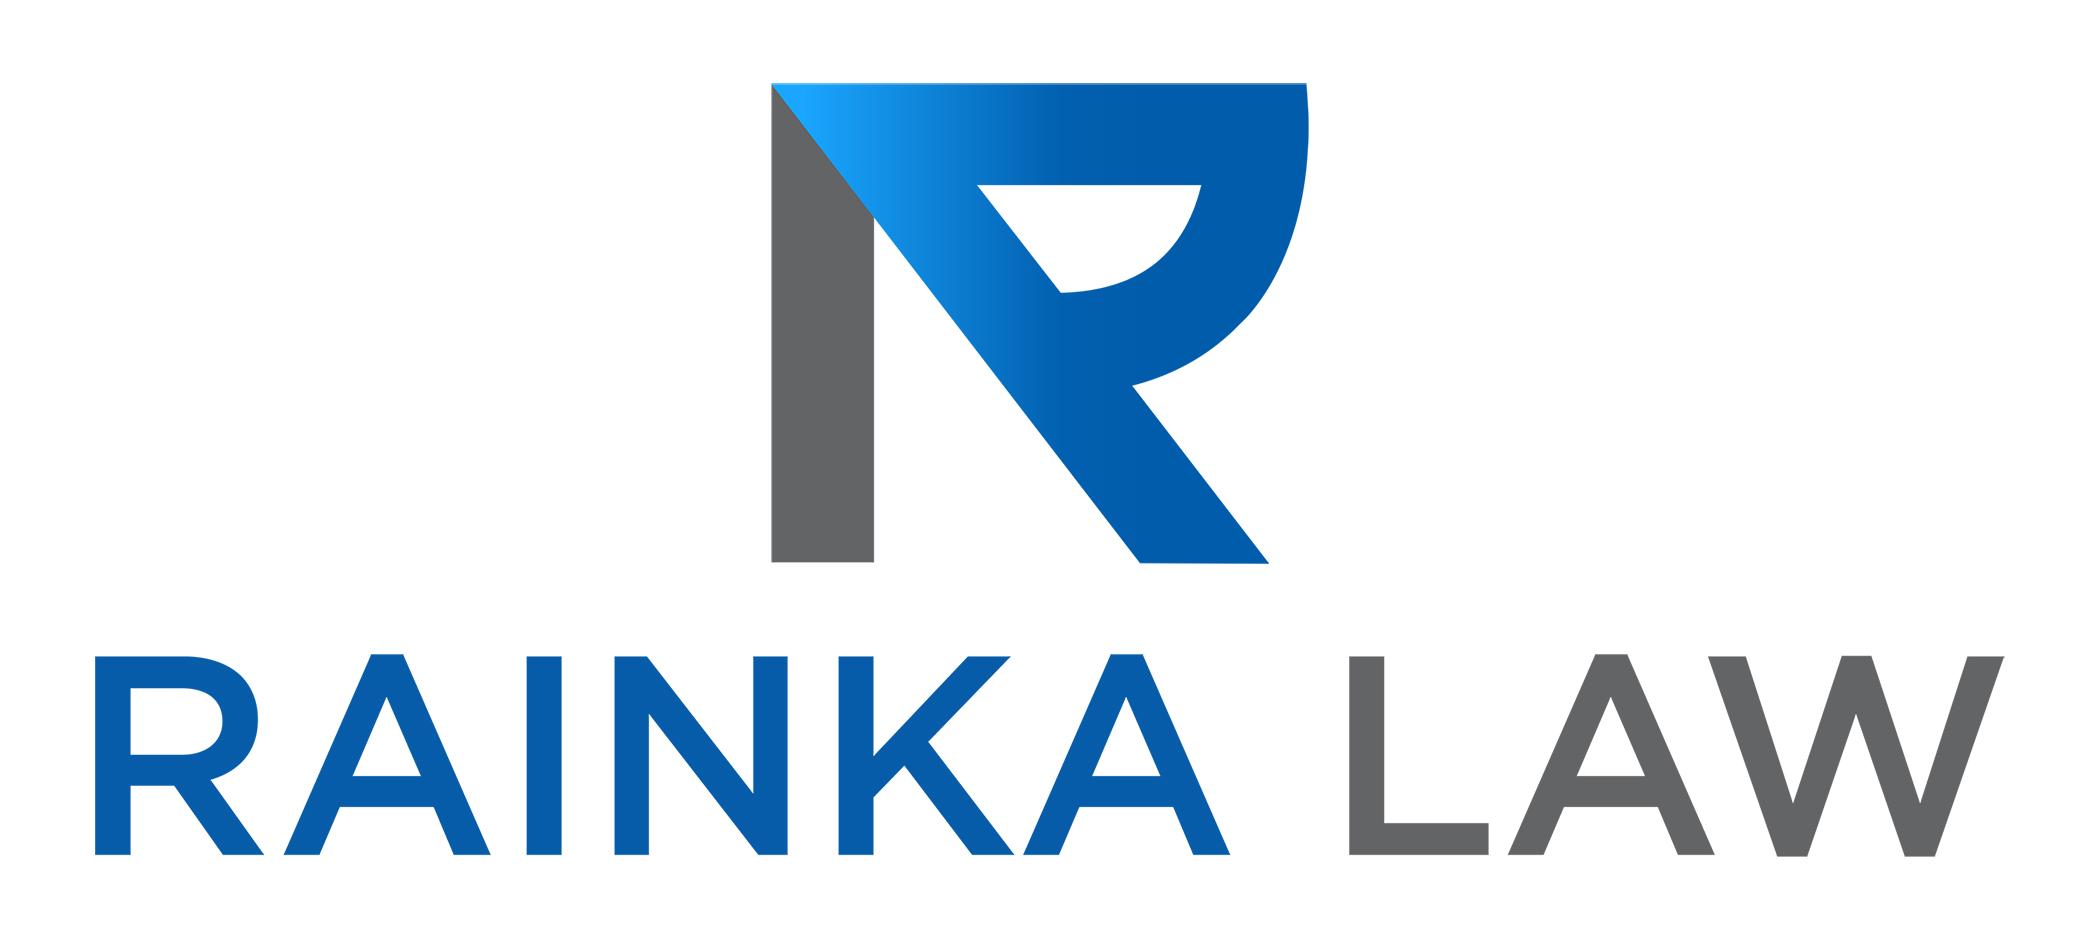 Rainka Law, LLC Profile Picture